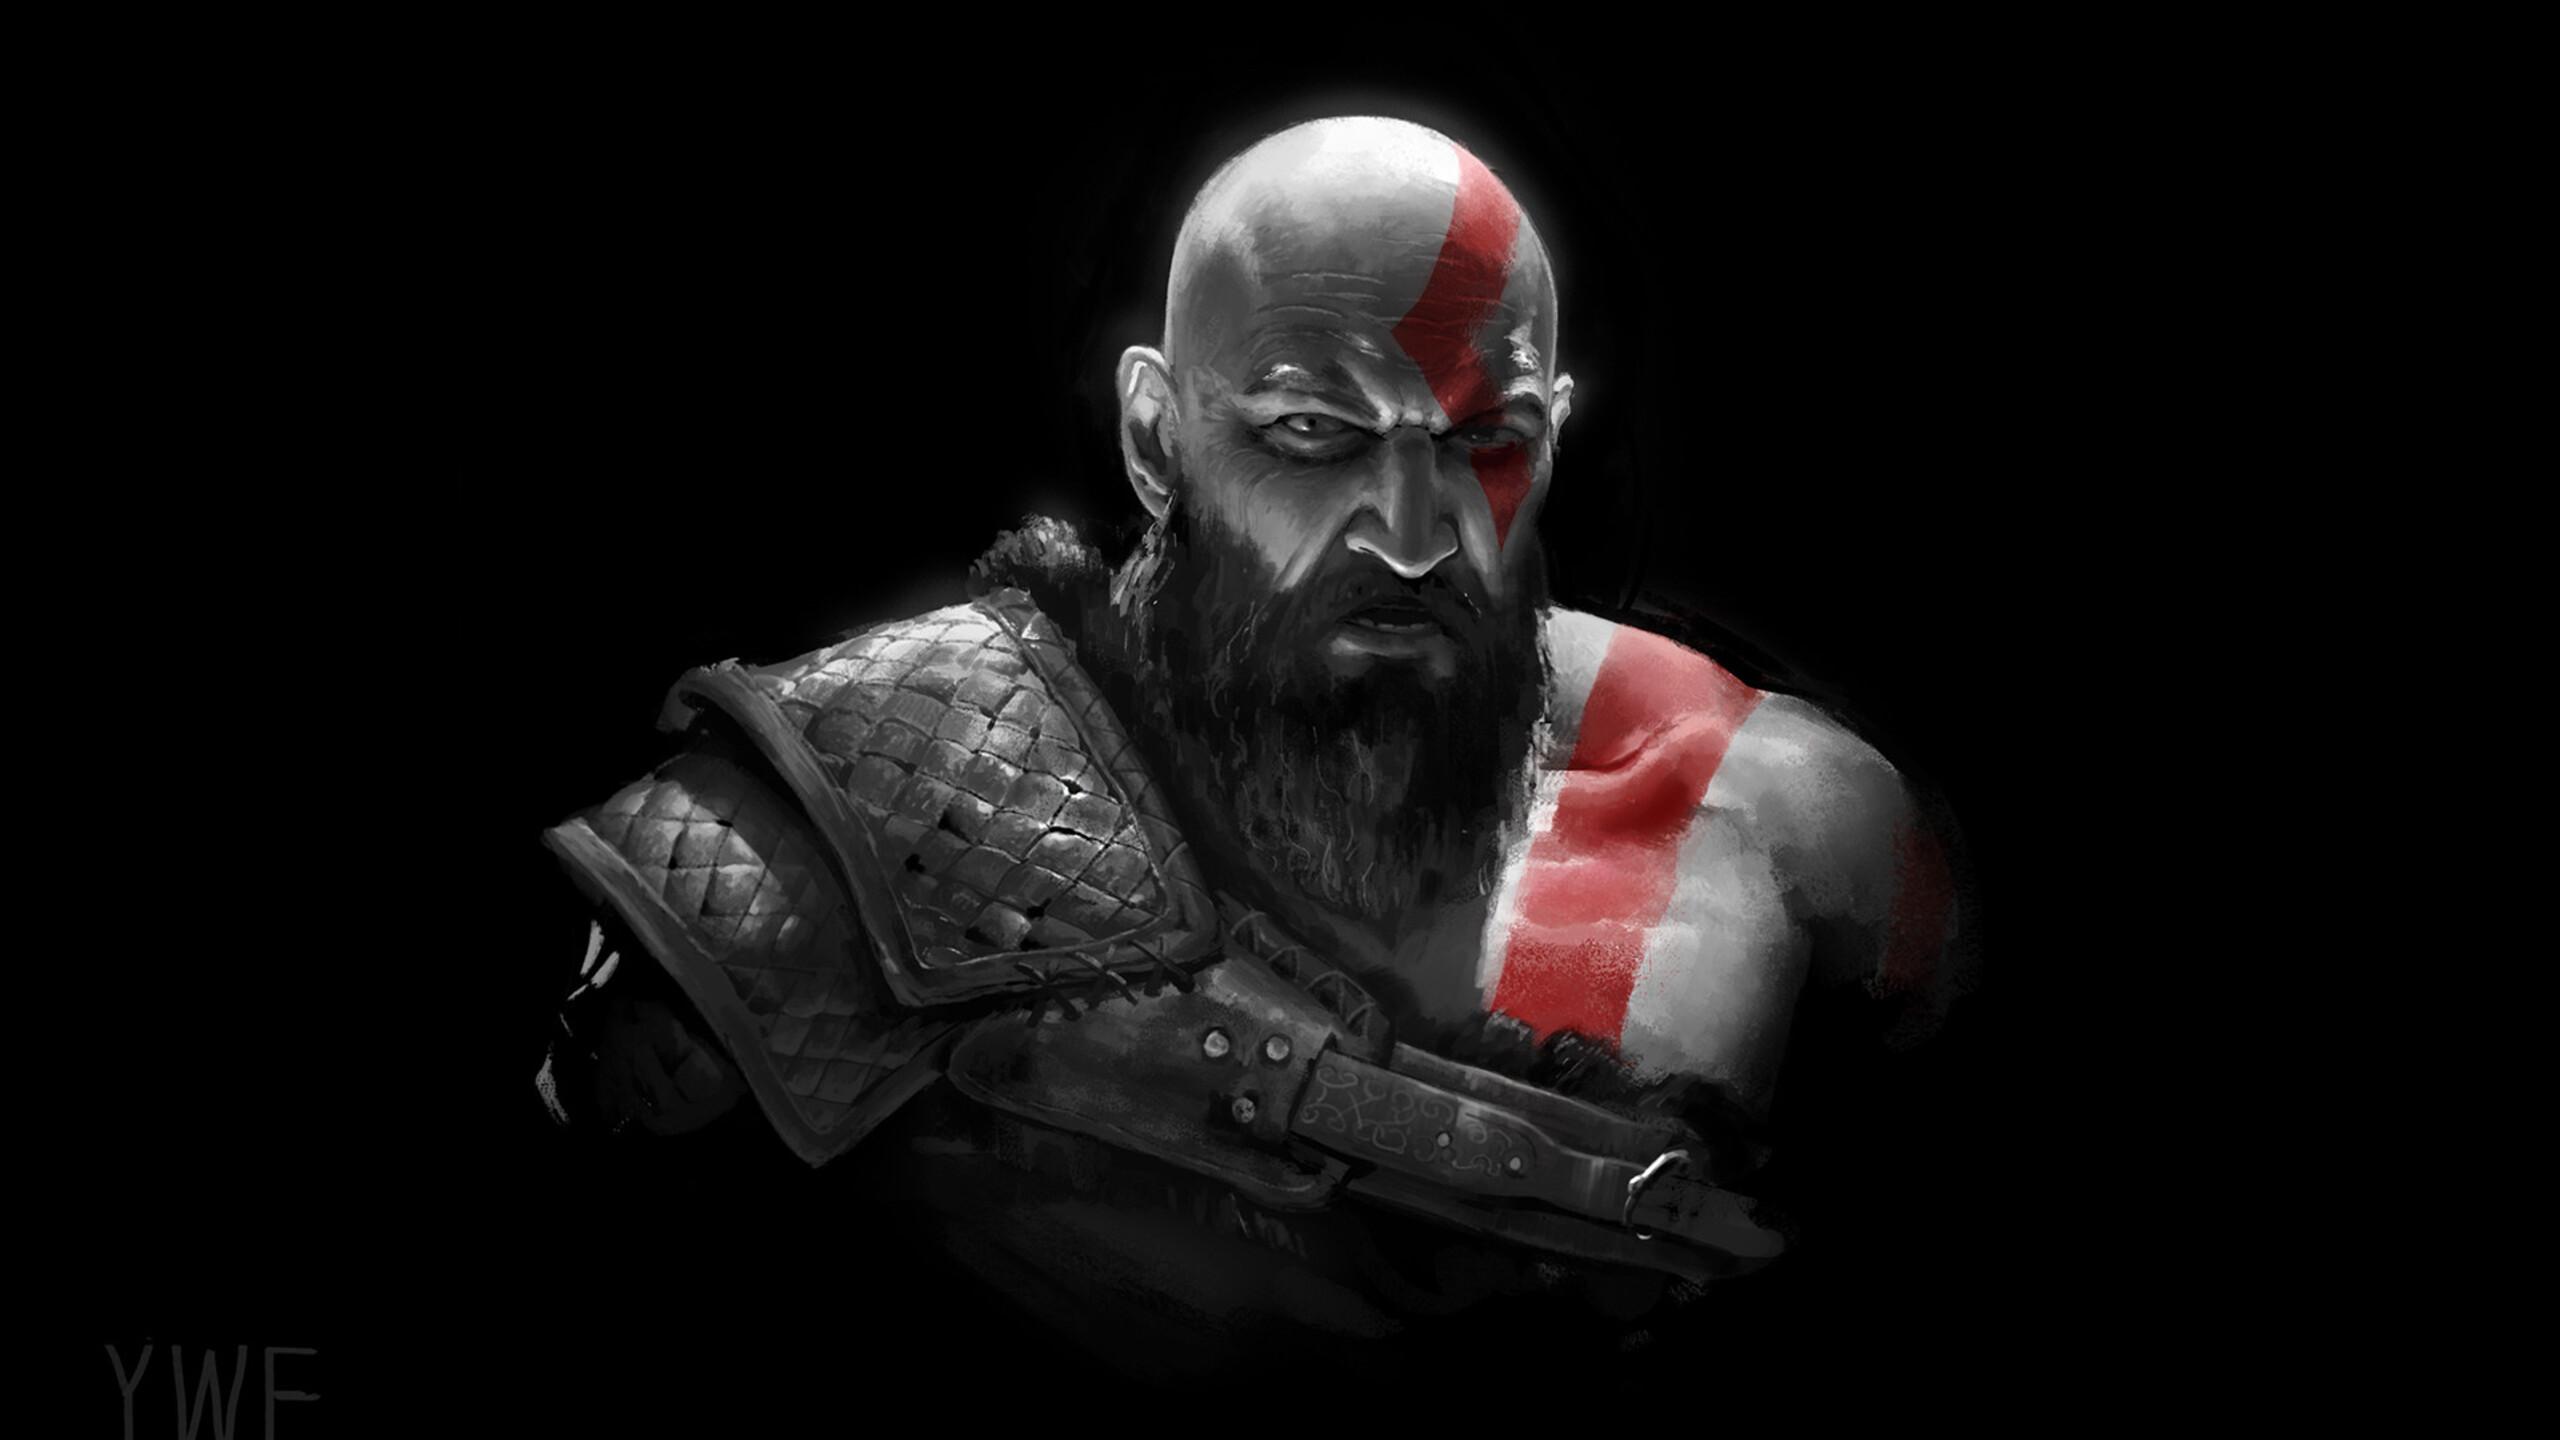 kratos-in-god-of-war-2018-1u.jpg